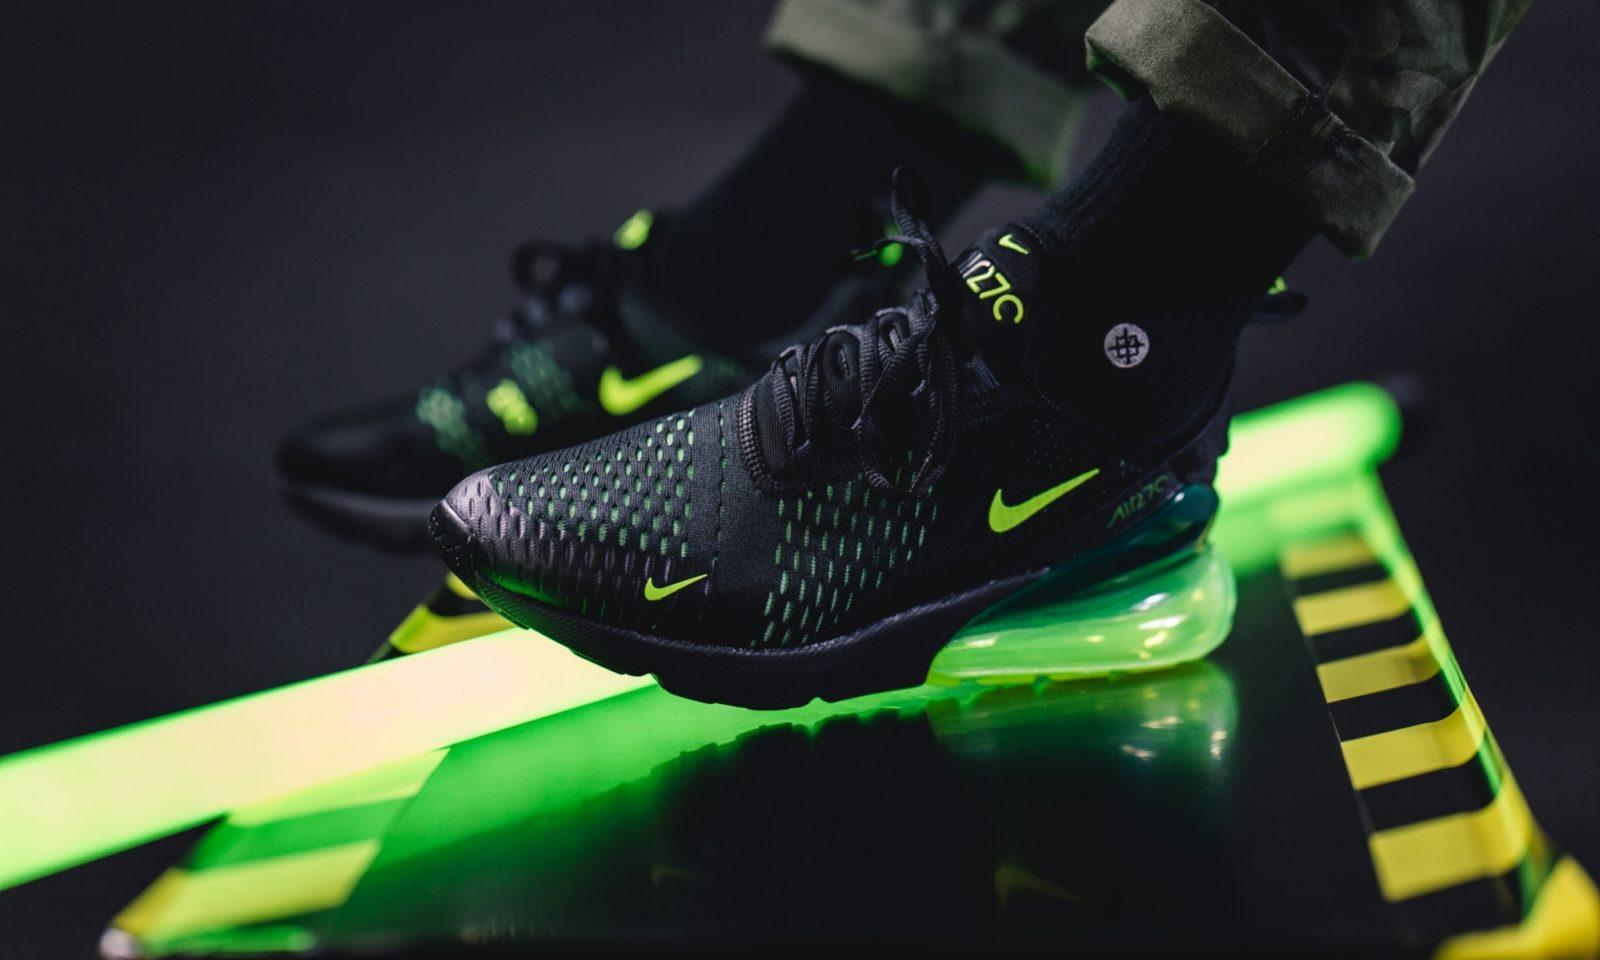 nike air max 270 schwarz neon green